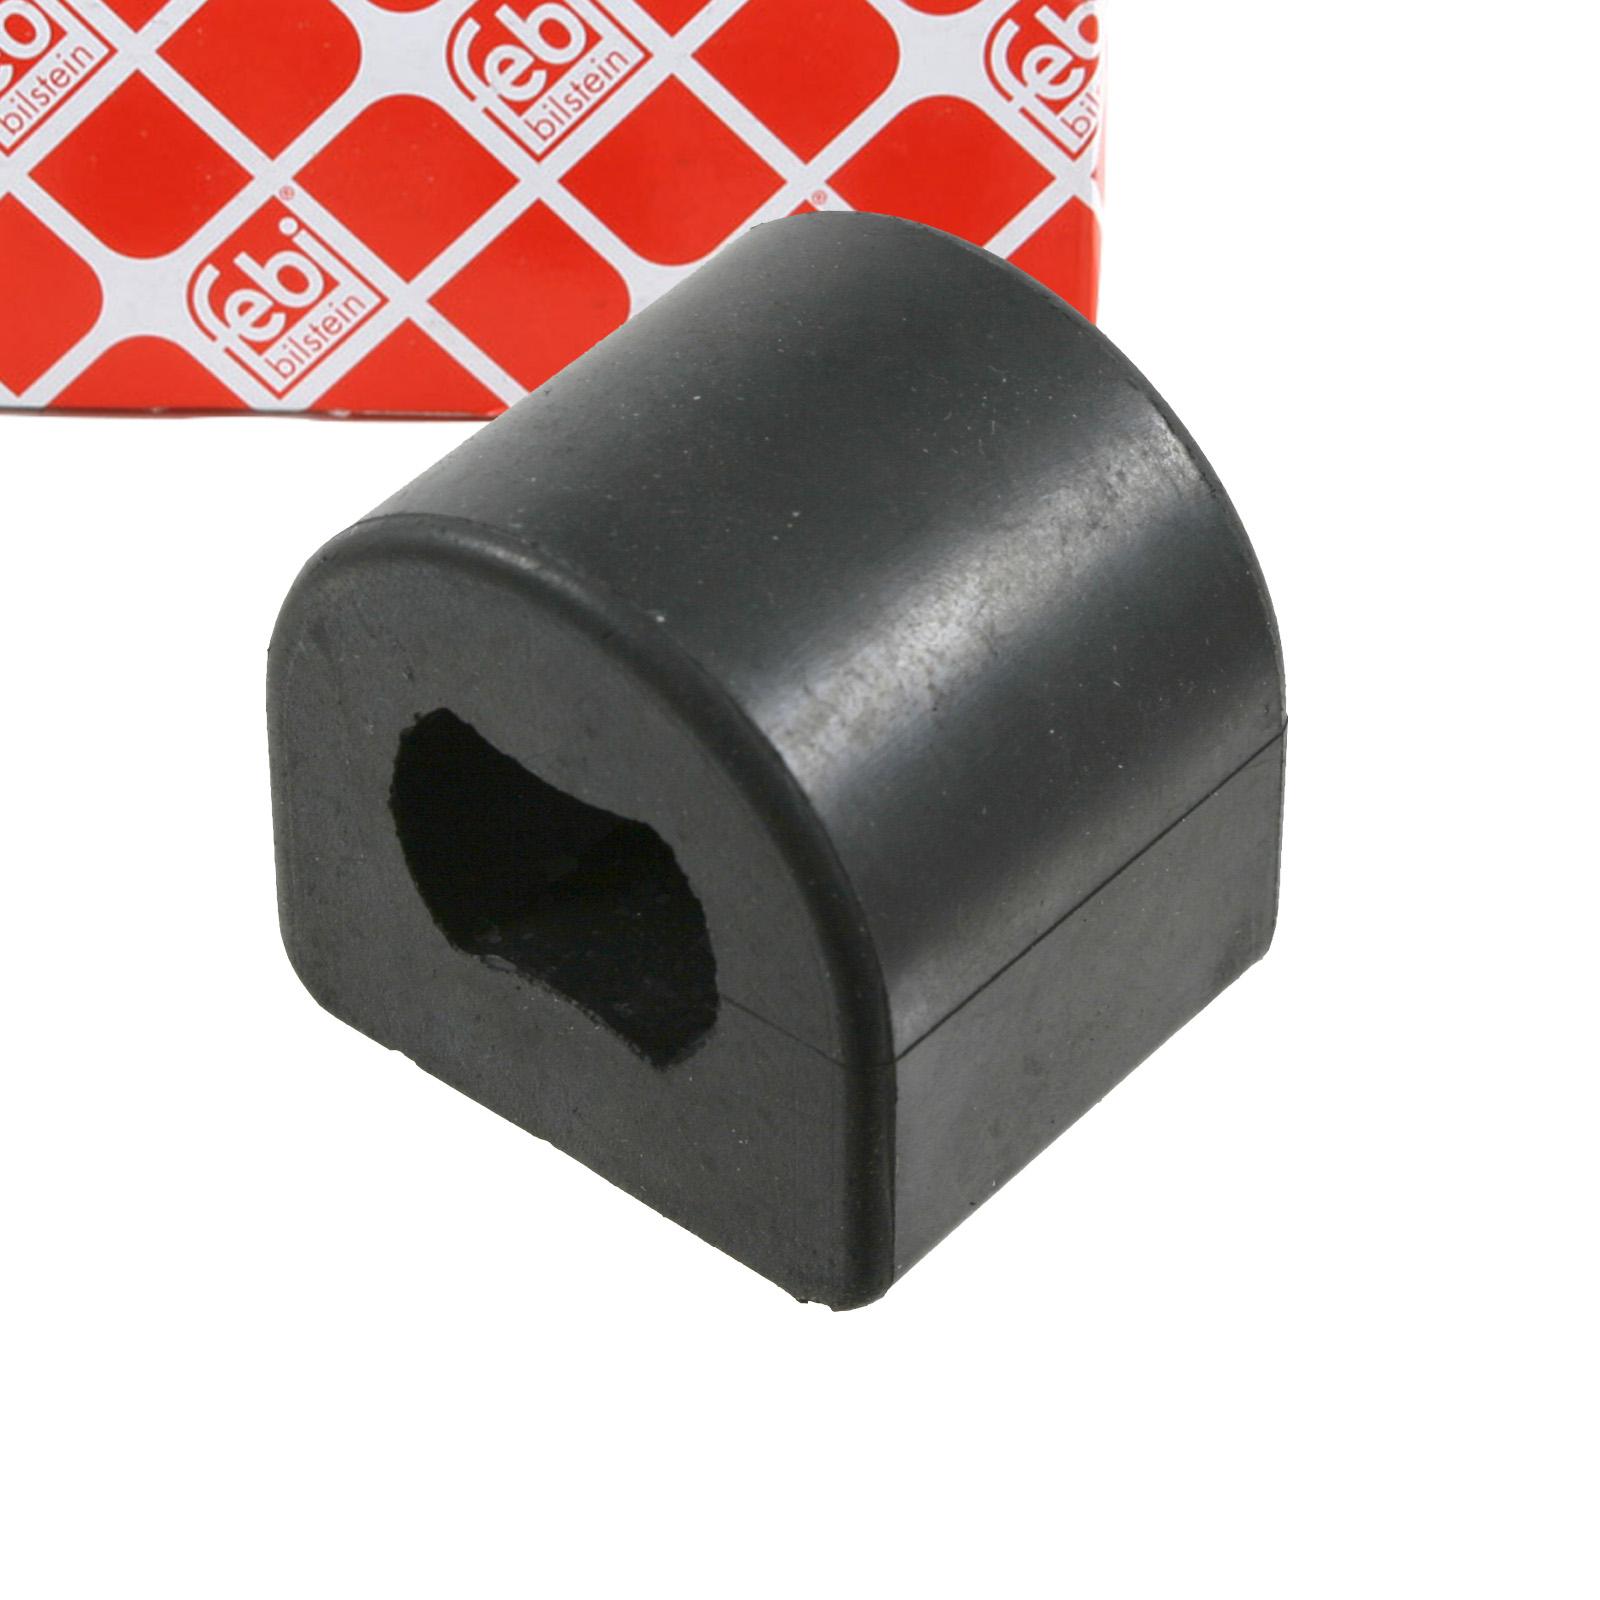 2x FEBI 21823 Stabilisatorlager PEUGEOT 605 (6B) 607 (9D, 9U) hinten